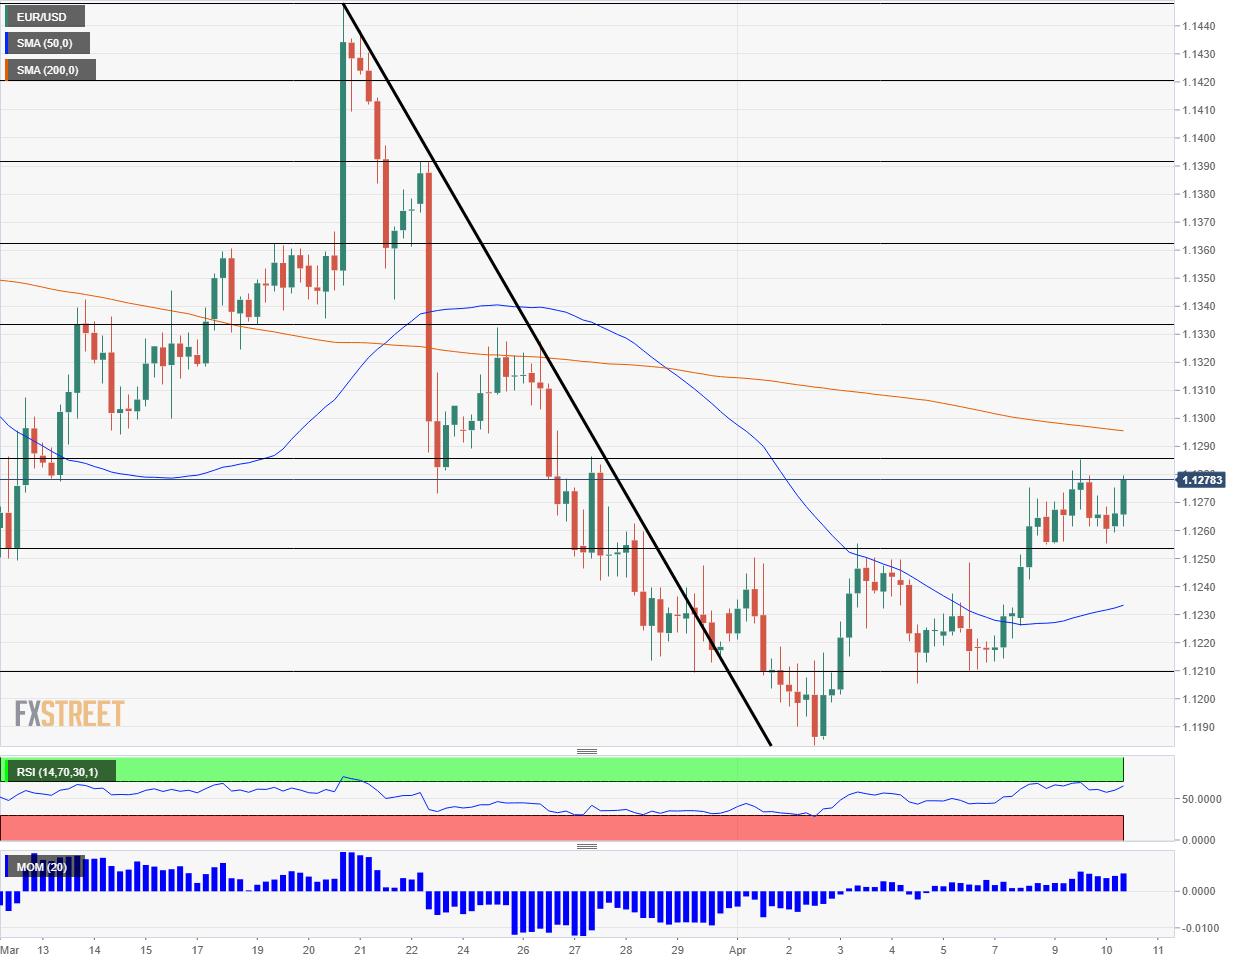 EUR USD technical analysis April 10 2019